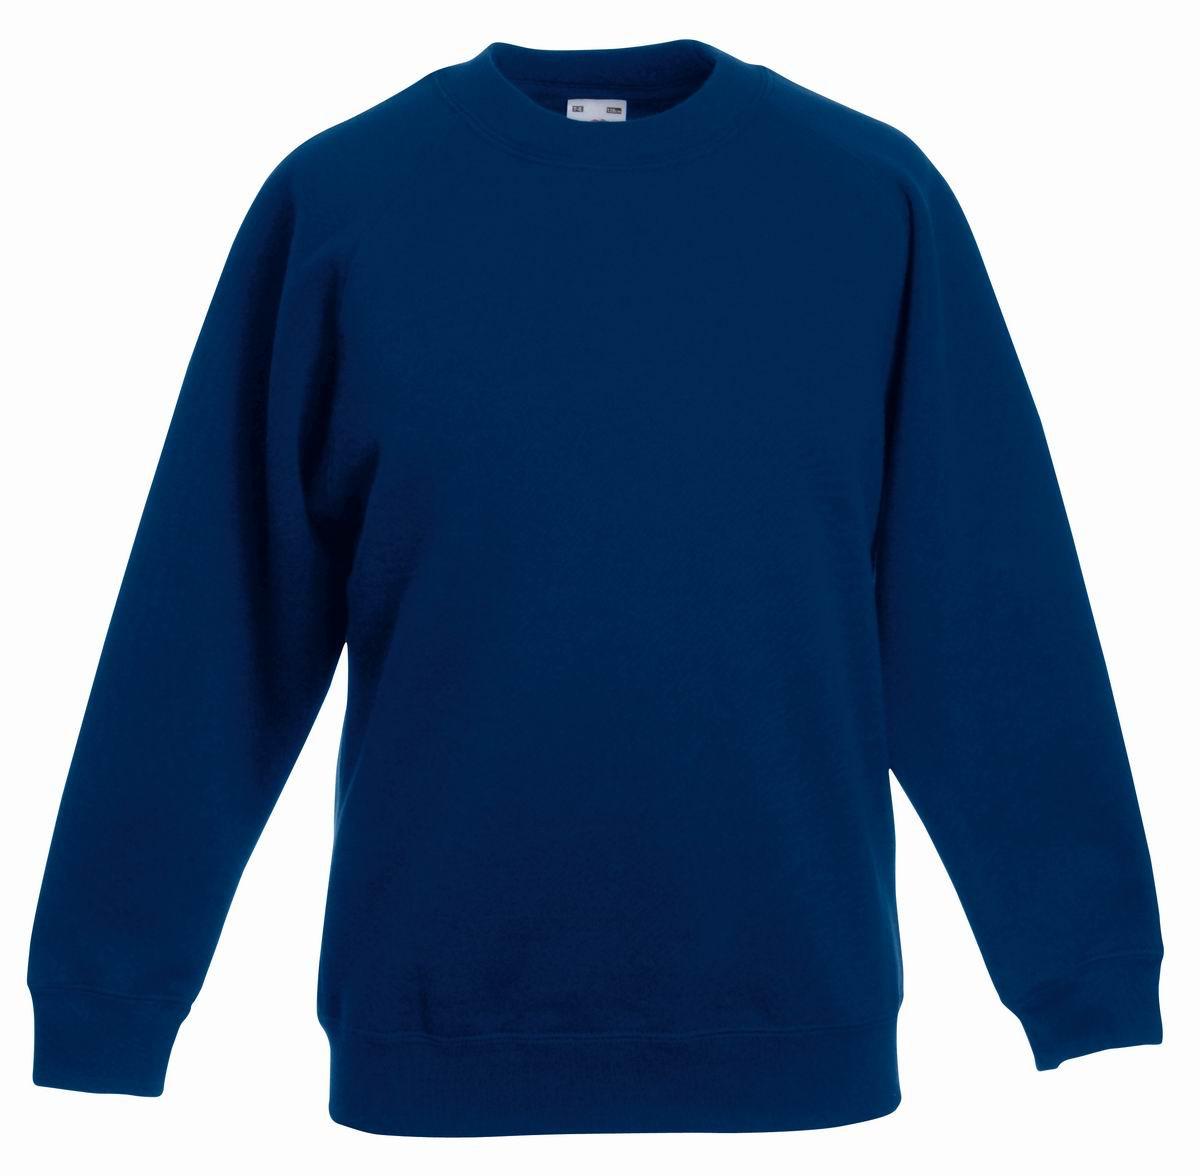 Толстовка детская Classic Kids Raglan Sweat, рост 116 (5-6лет), Тёмно-синий